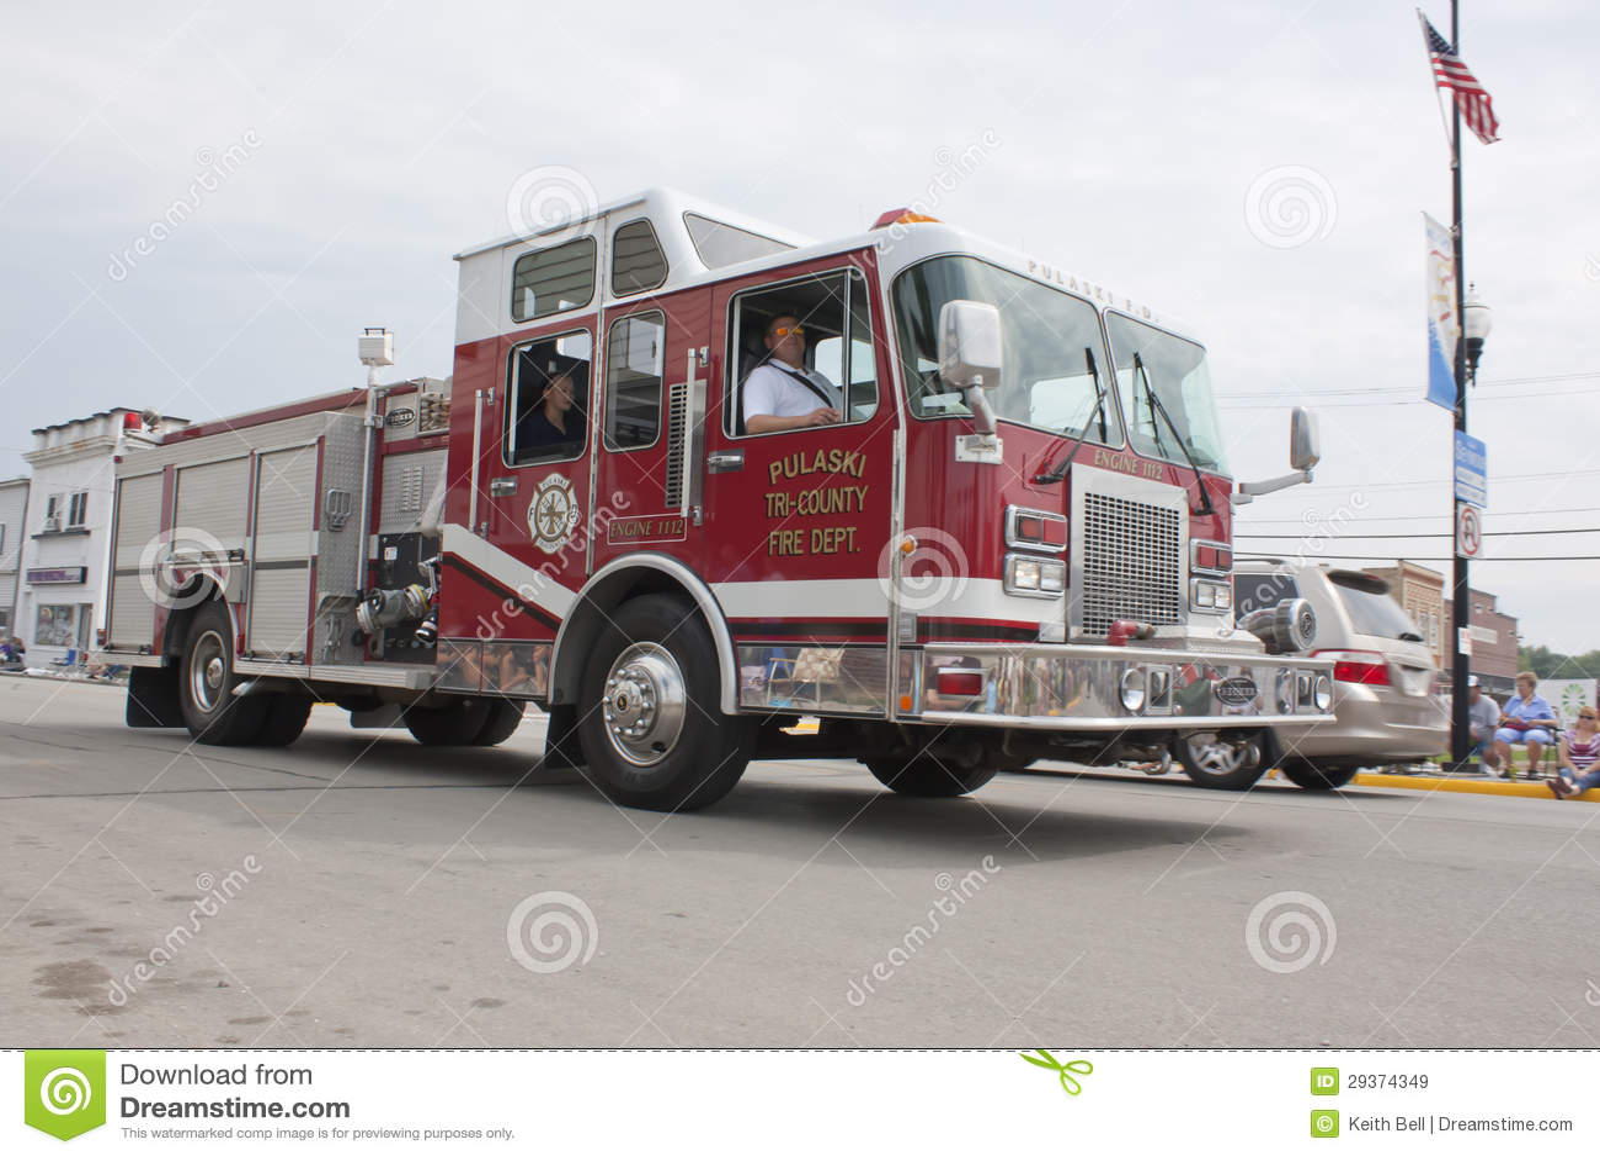 Pulaski三县引擎1112年救火车编...